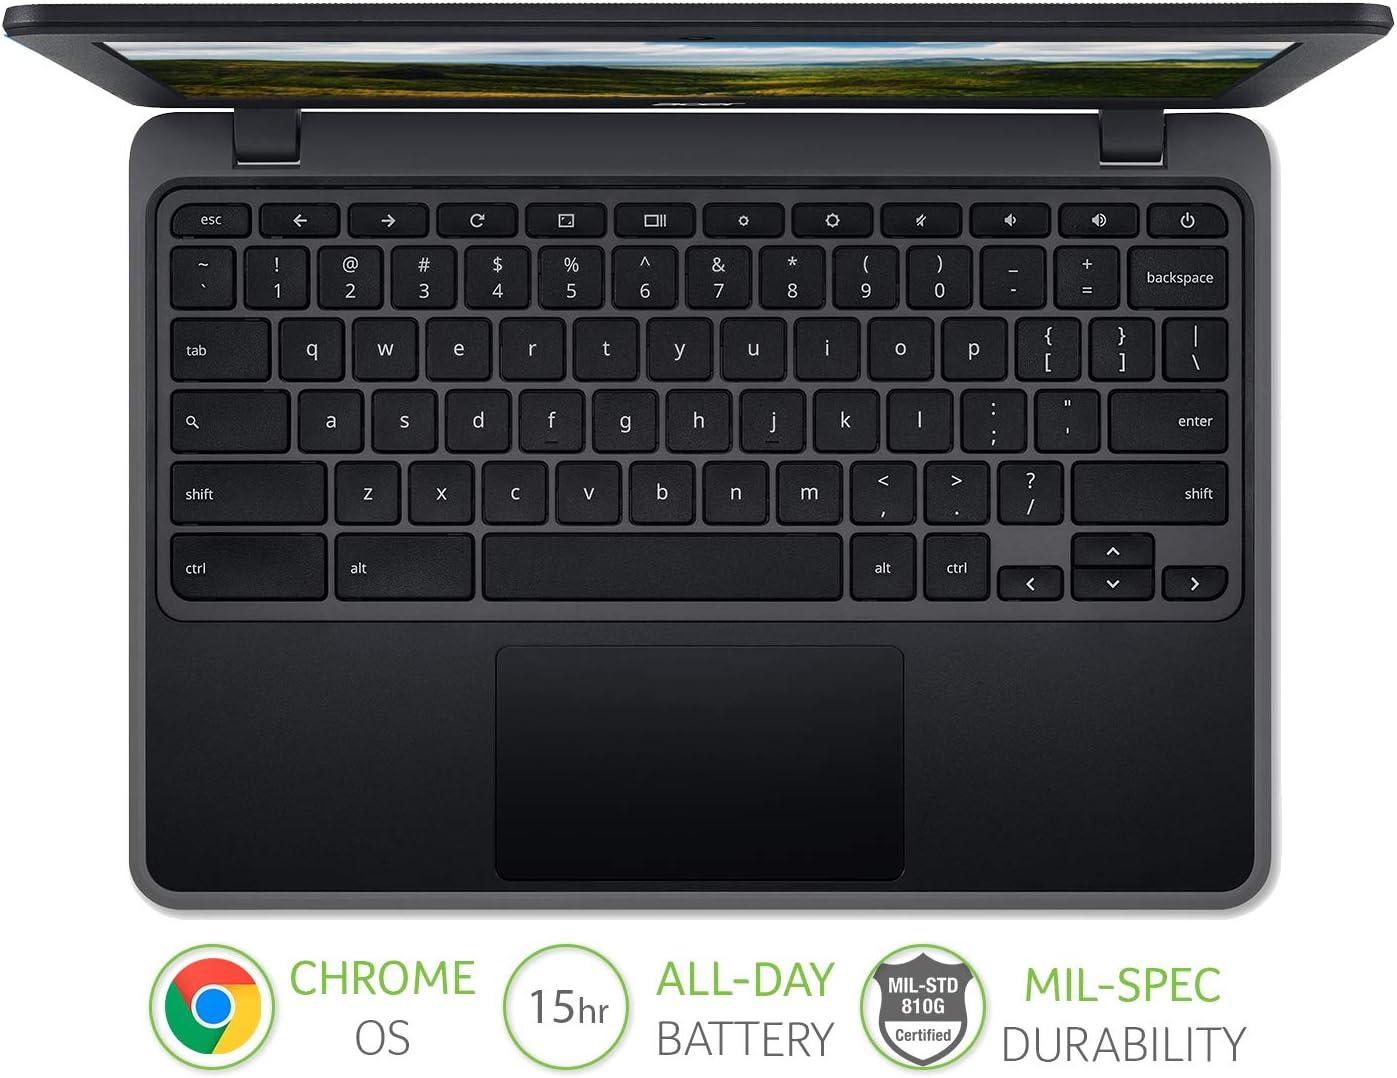 MediaTek 8183, 4GB RAM, 32GB eMMC, 11.6 inch HD Display, Chrome OS, Black Acer Chromebook 311 C722